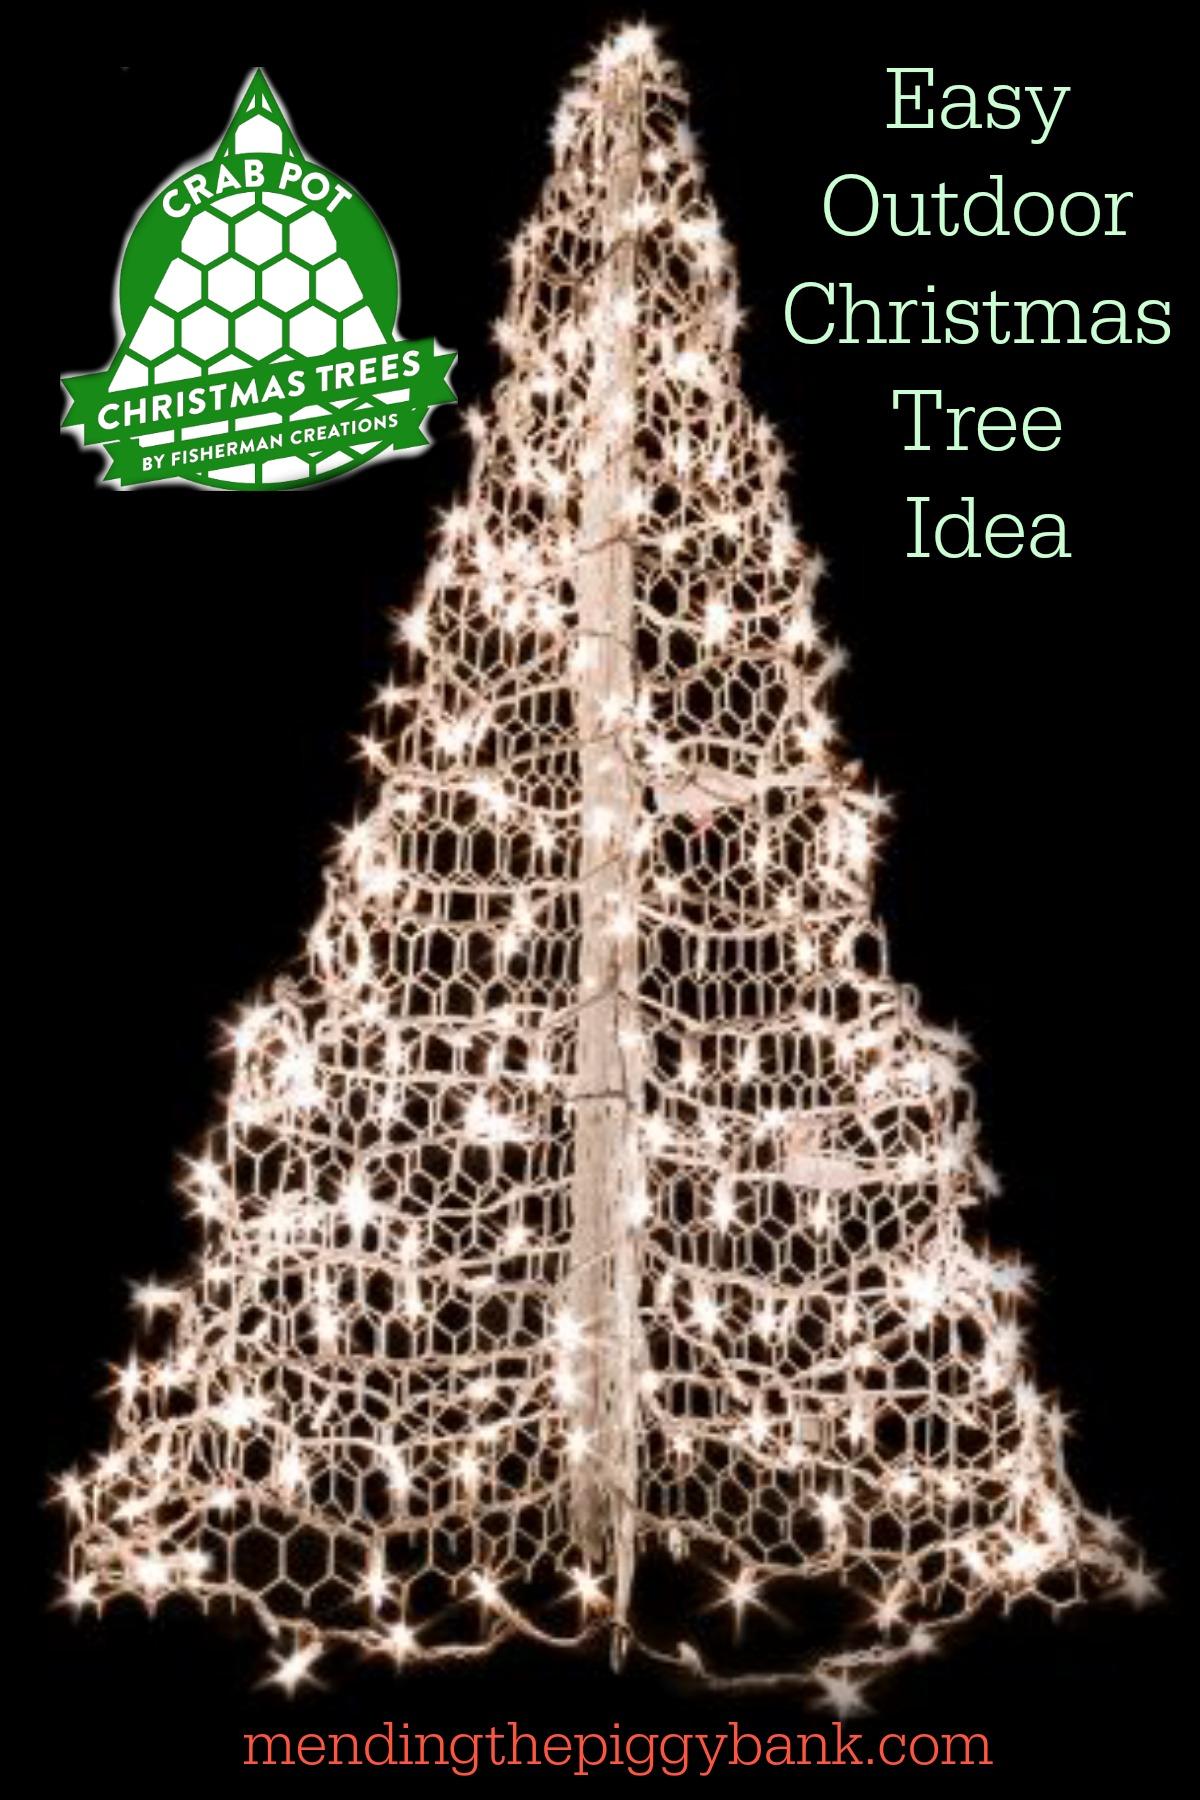 Easy Outdoor Christmas Tree Idea   Mending the Piggy Bank